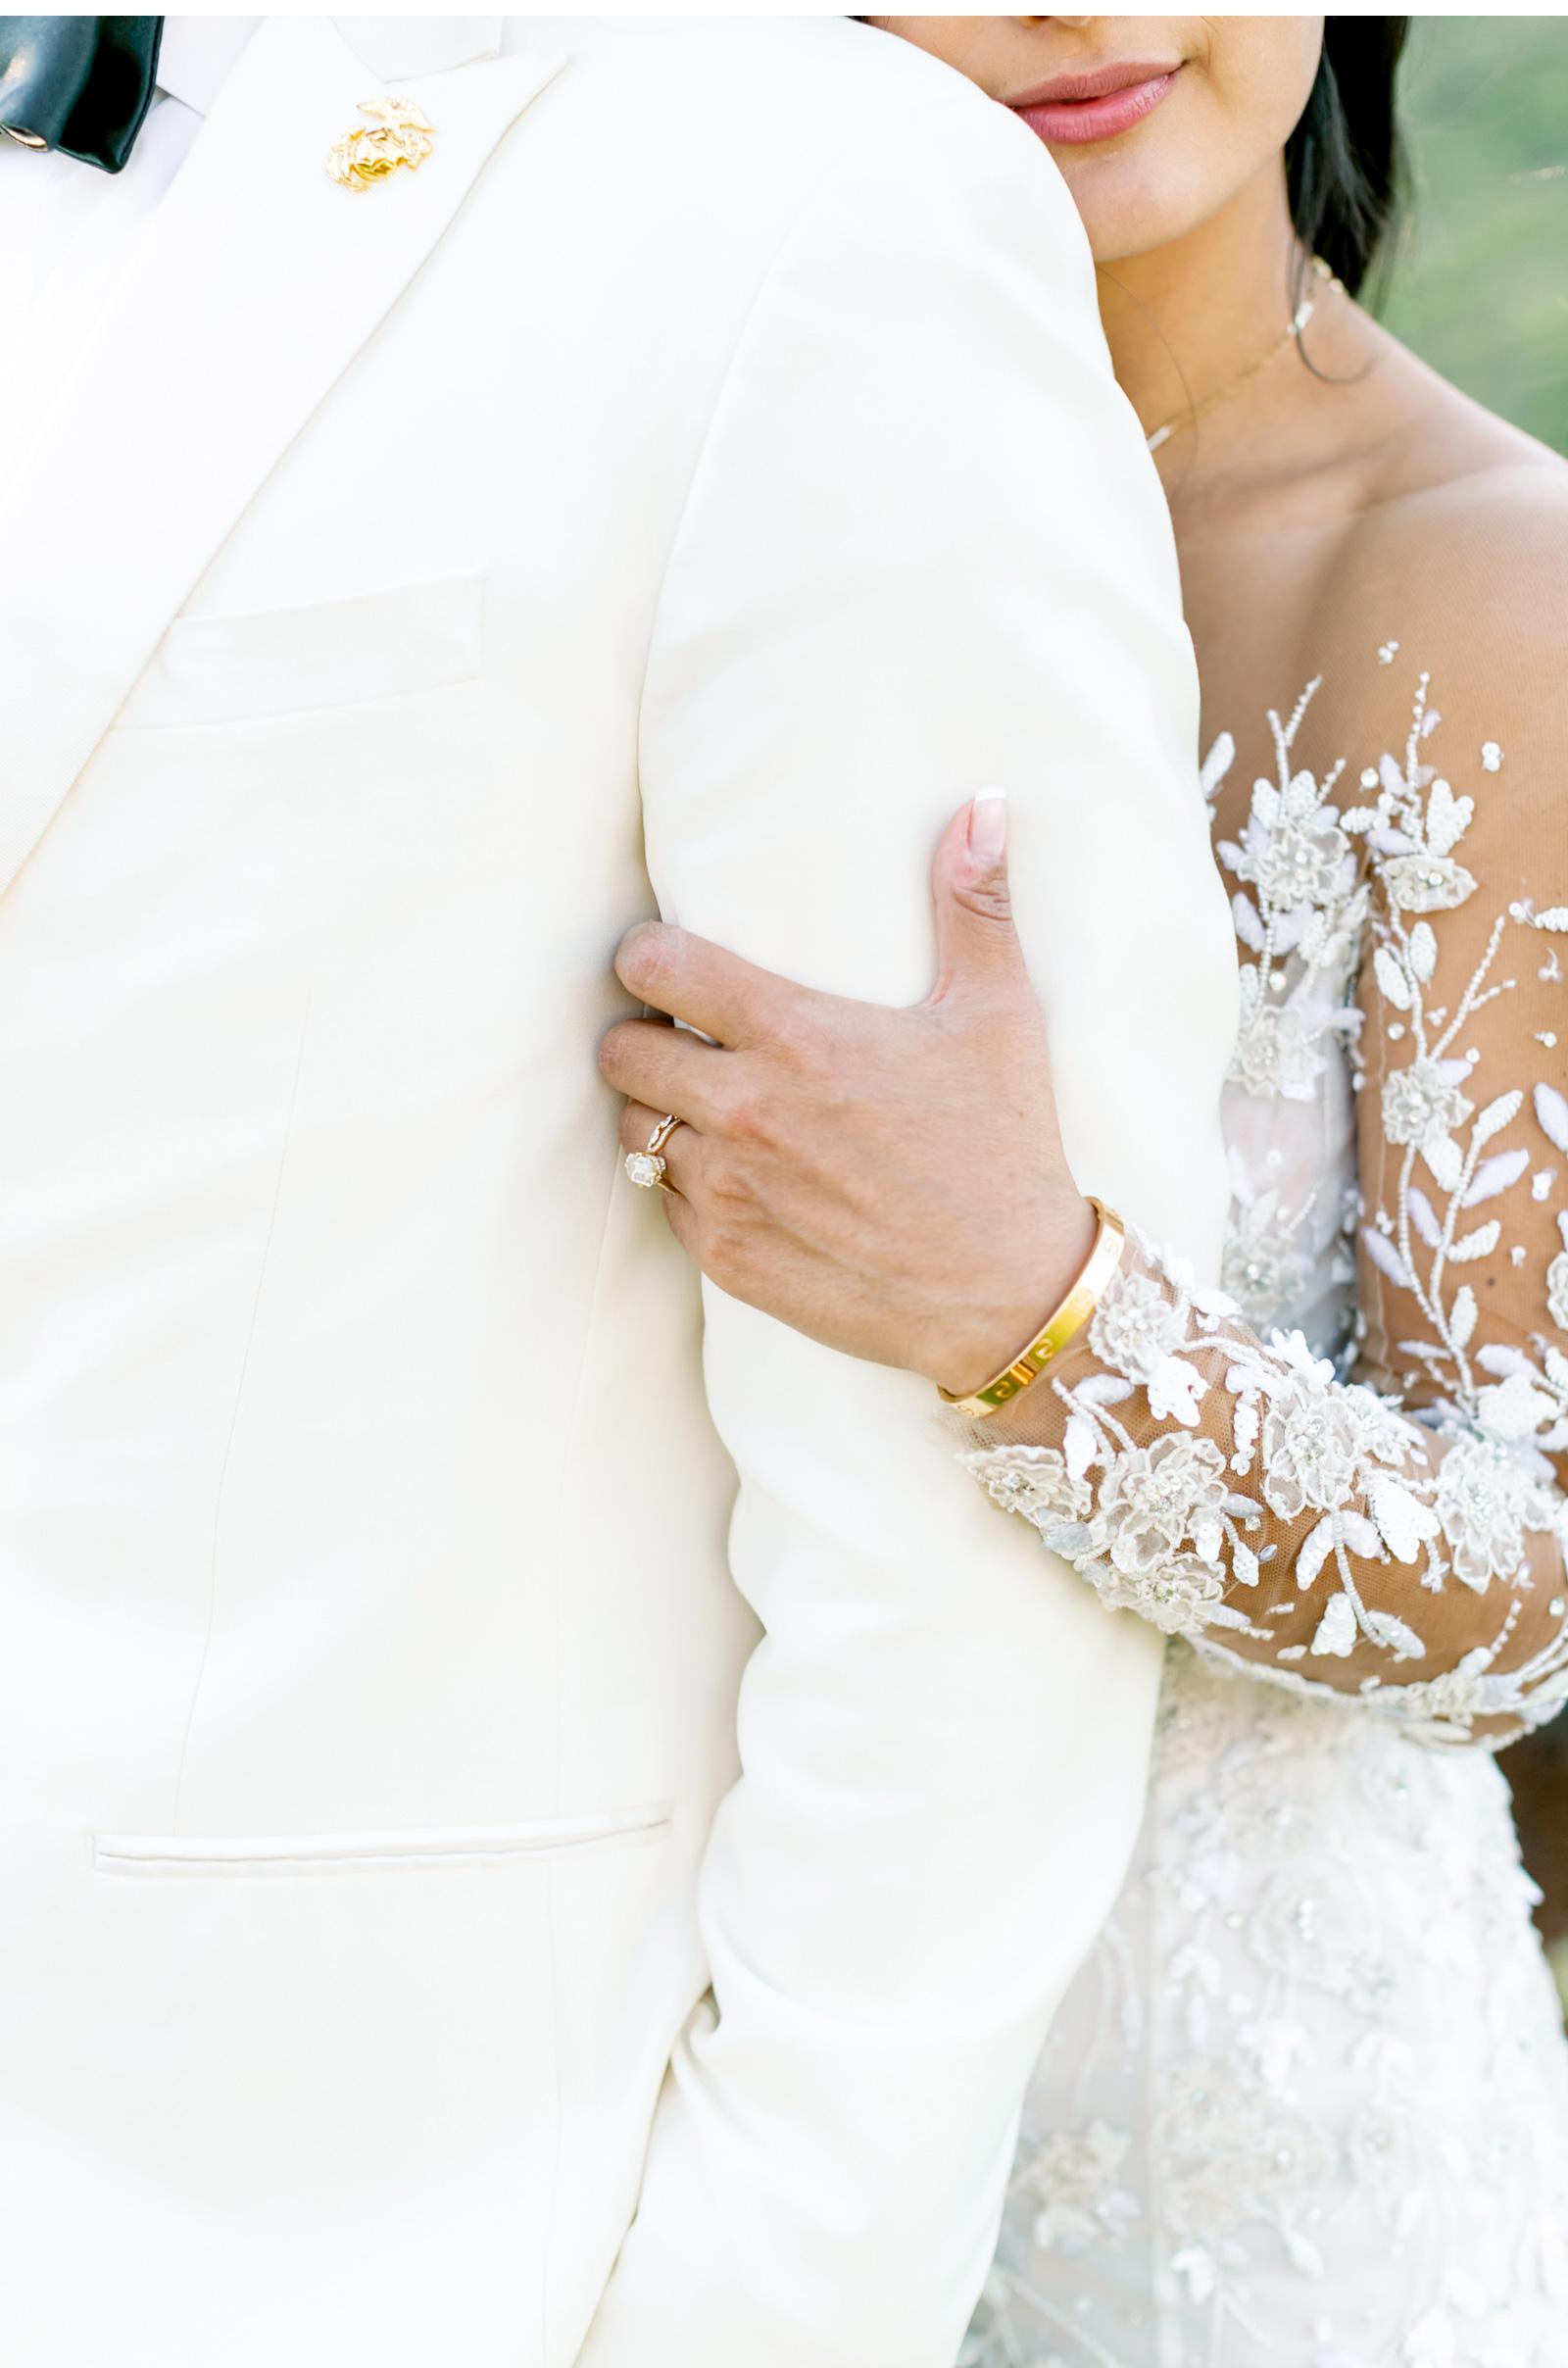 Malibu-Wedding-Photographer-Southern-California-Wedding-Venues-Malibu-Wedding-Photographer-Natalie-Schutt-Photography_07.jpg